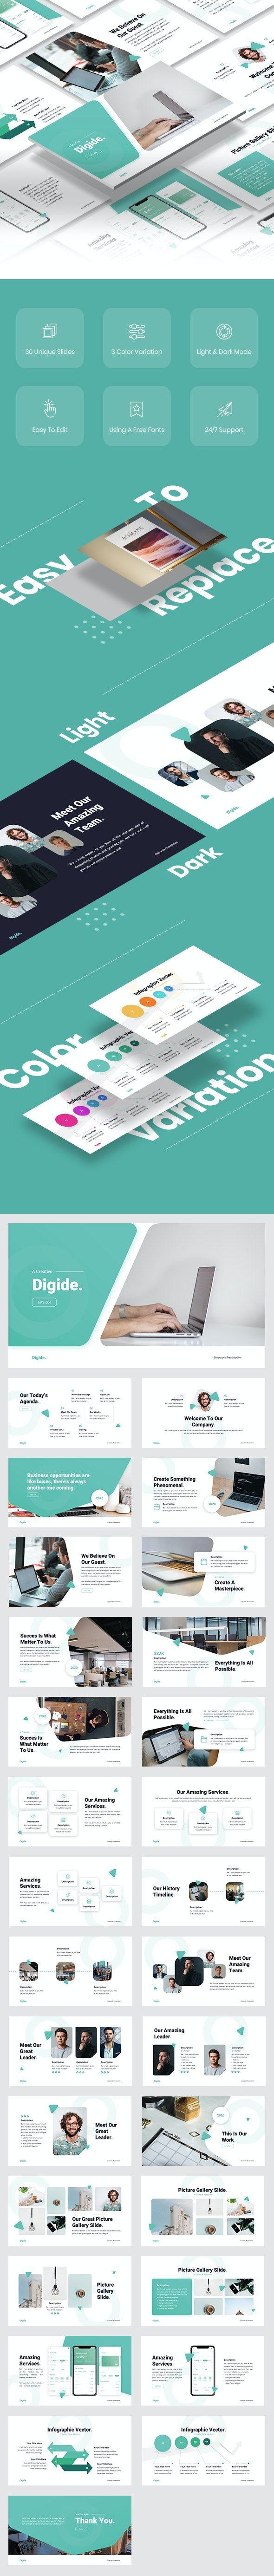 Digide - Startup Keynote Template